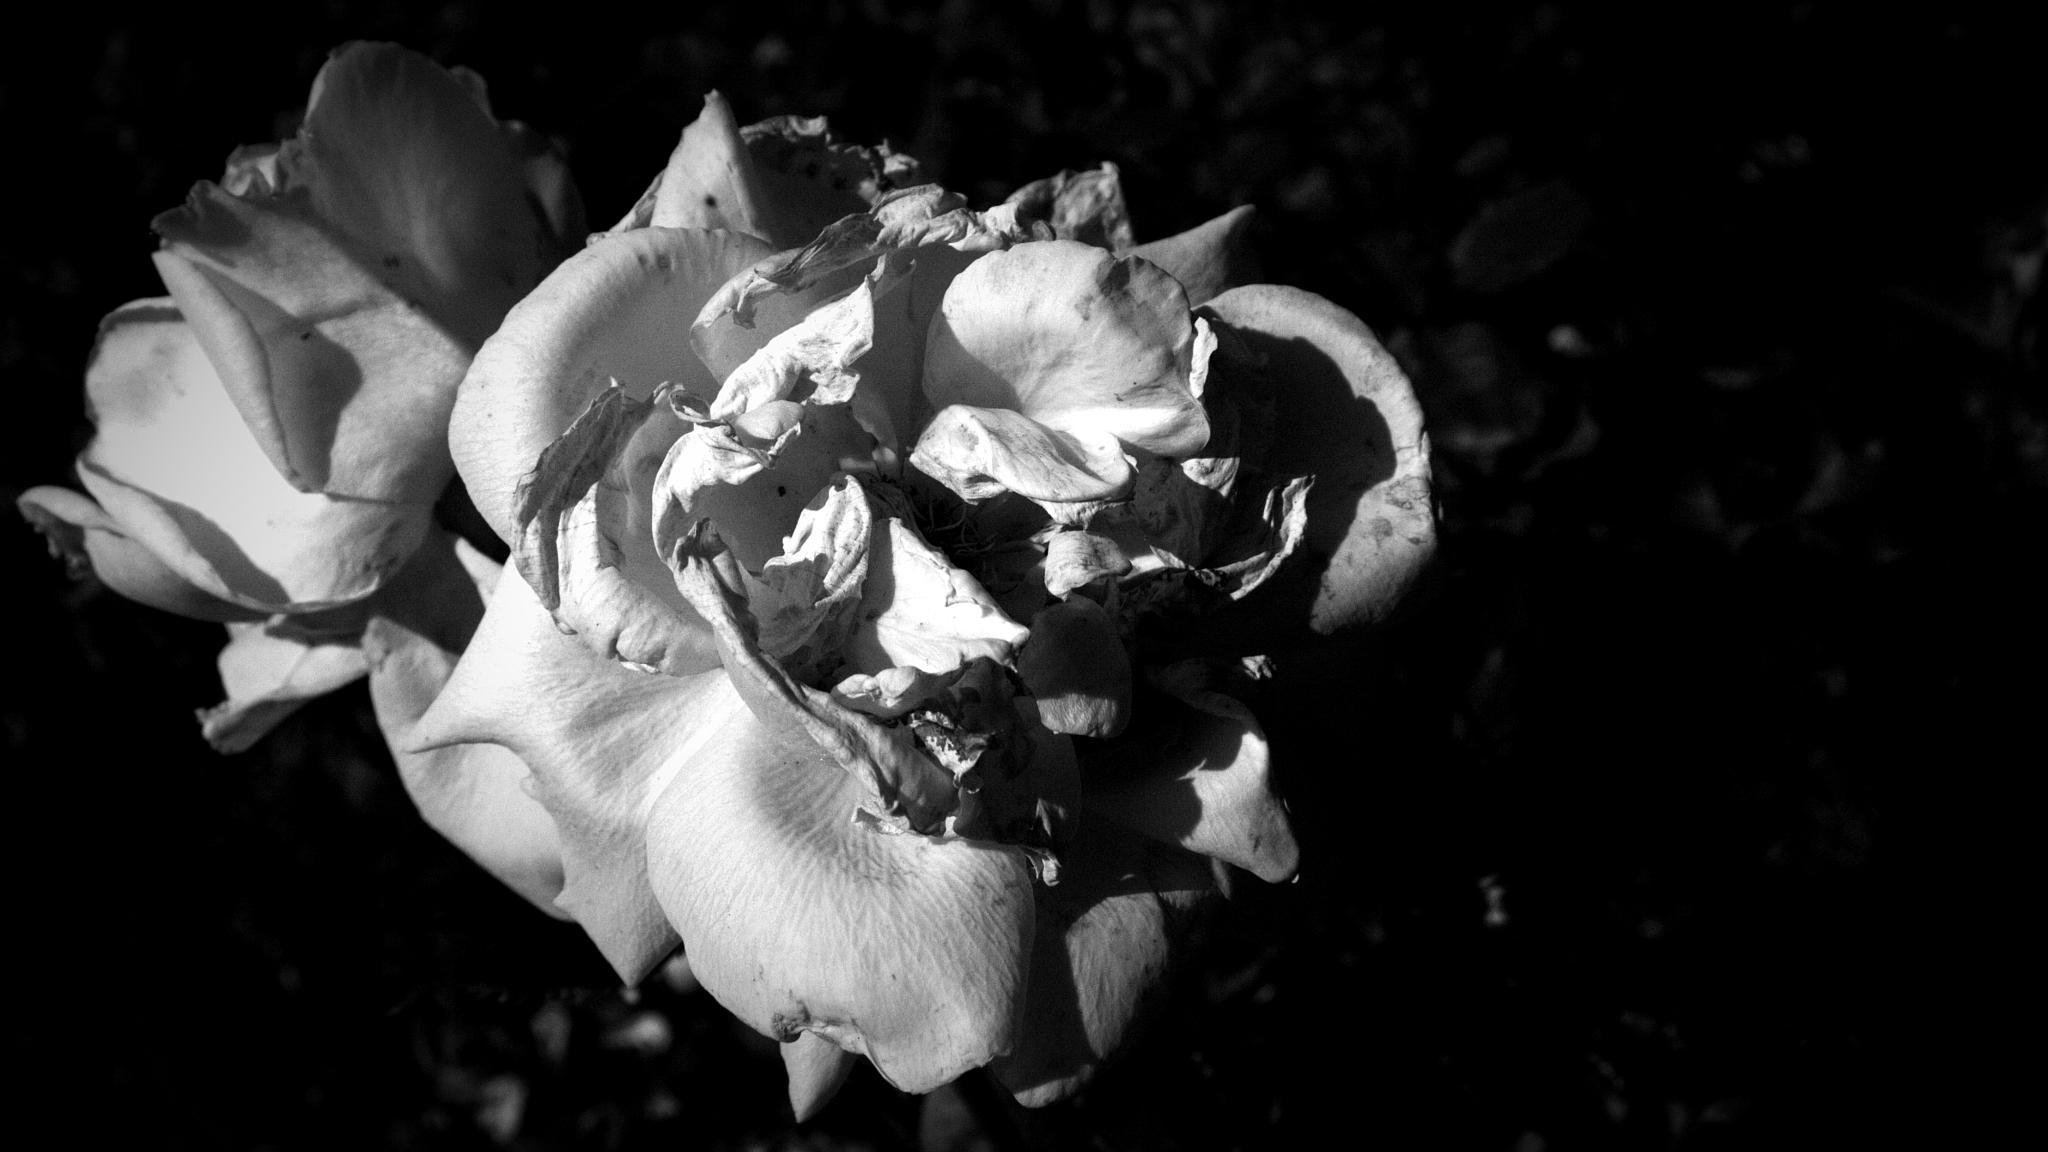 Just A Photograph 373 by Dorian Stretton